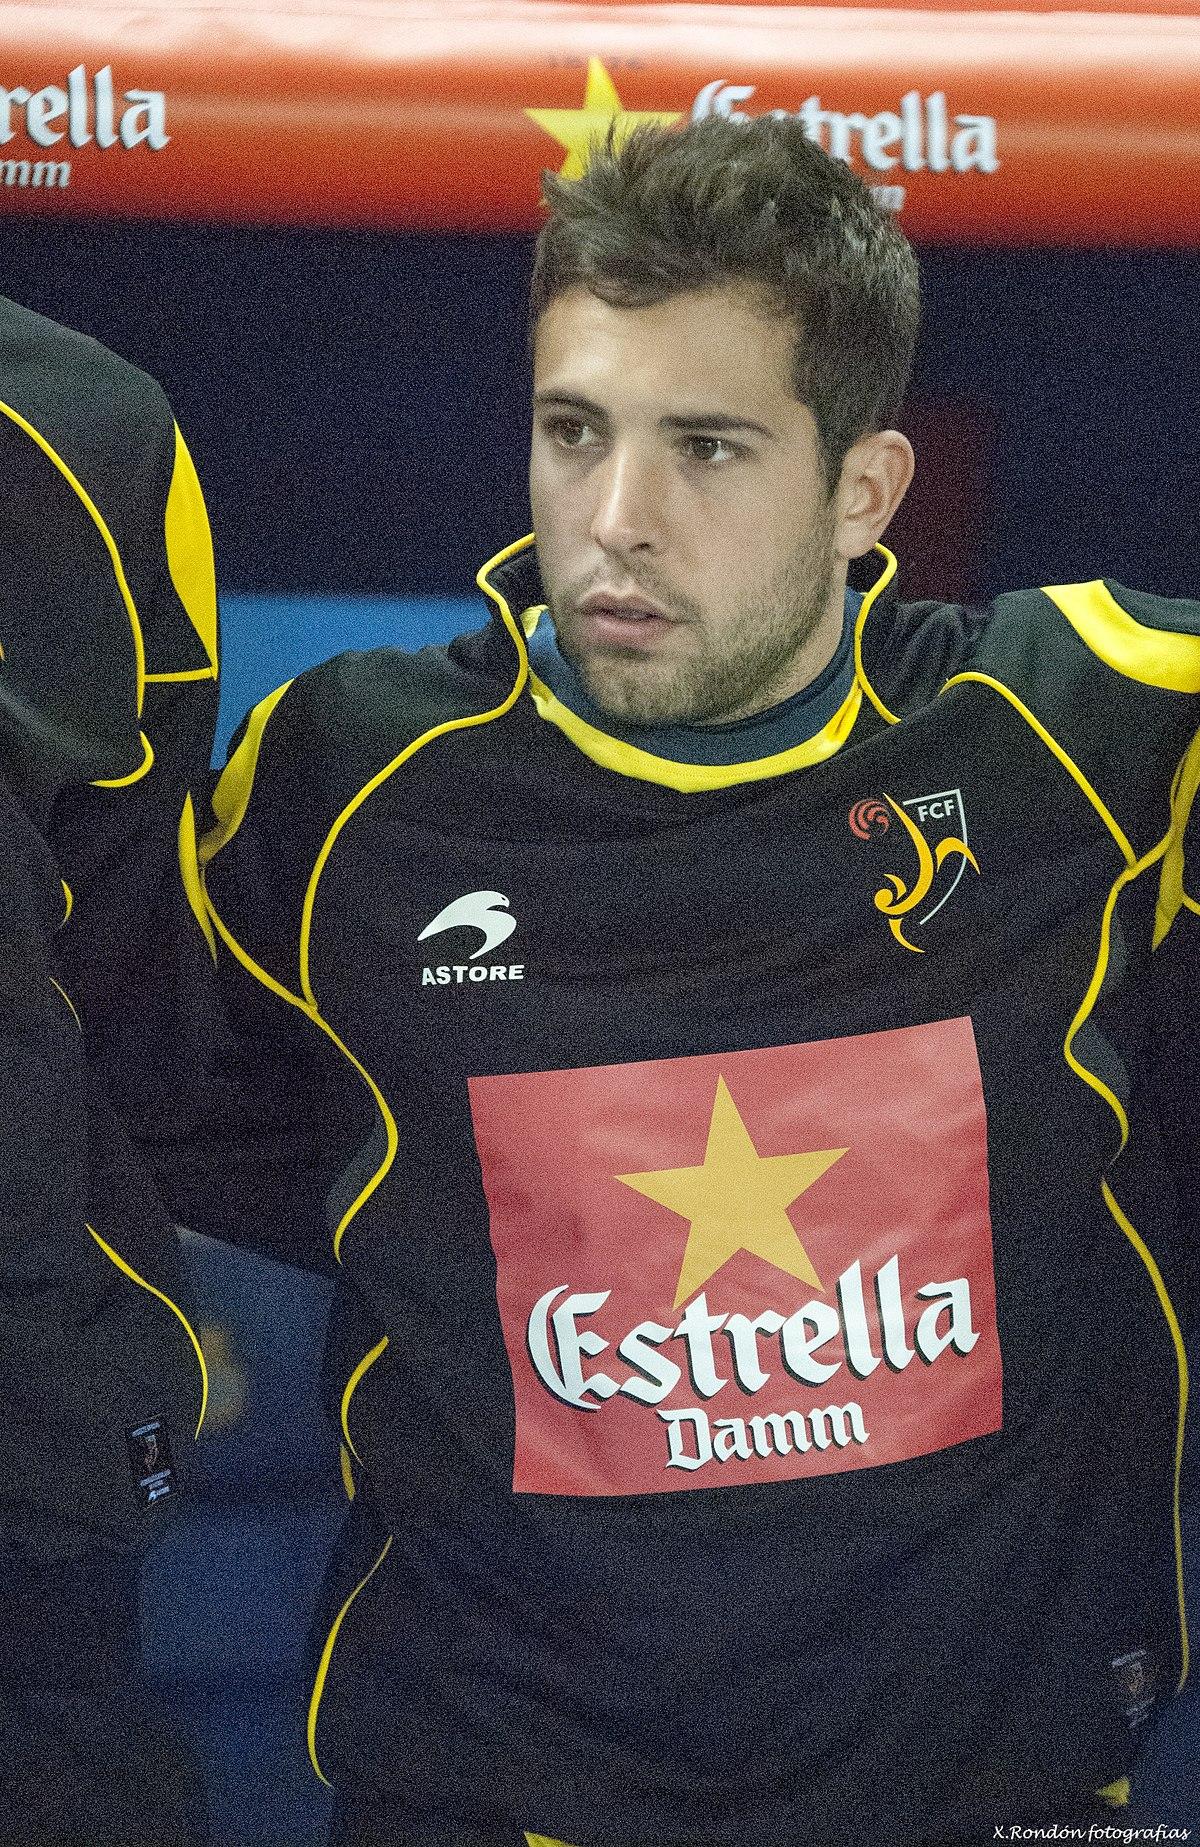 Jordi Alba den frie encyklop¦di